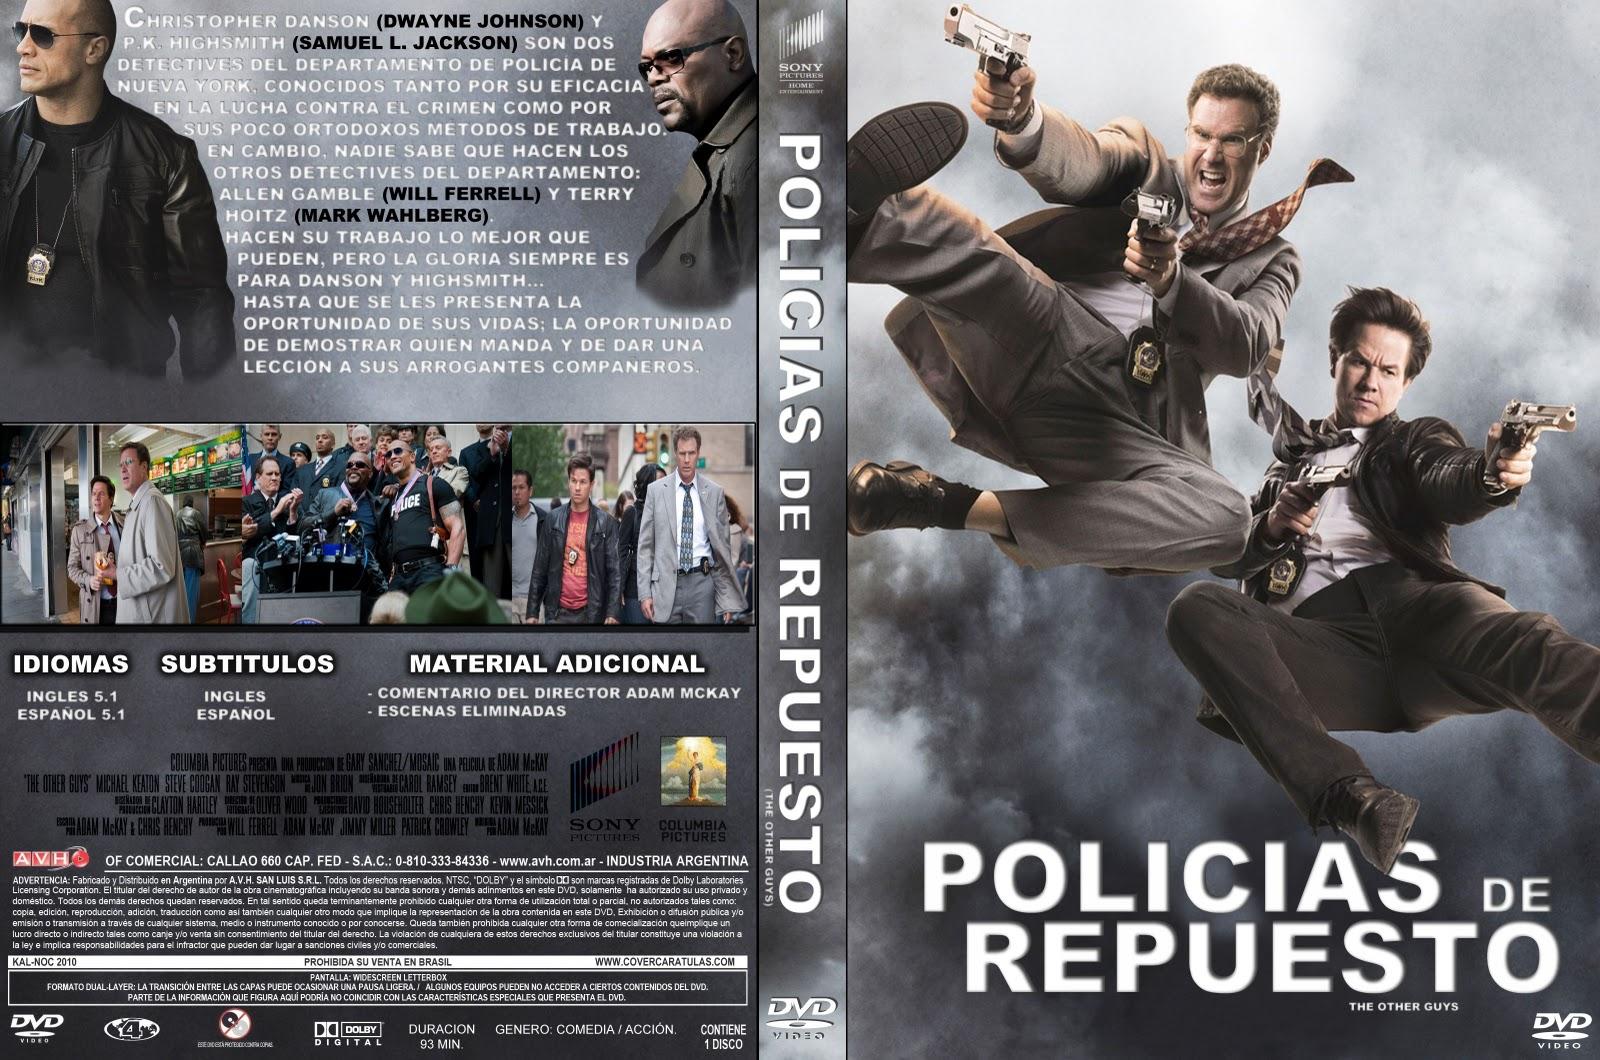 http://4.bp.blogspot.com/_8flS1gVTOKs/TROgMCLQj-I/AAAAAAAAAP0/LeCiCx2eKAE/s1600/Policias_De_Repuesto_-_Custom_por_kal-noc_%255Bdvd%255D_80.jpg